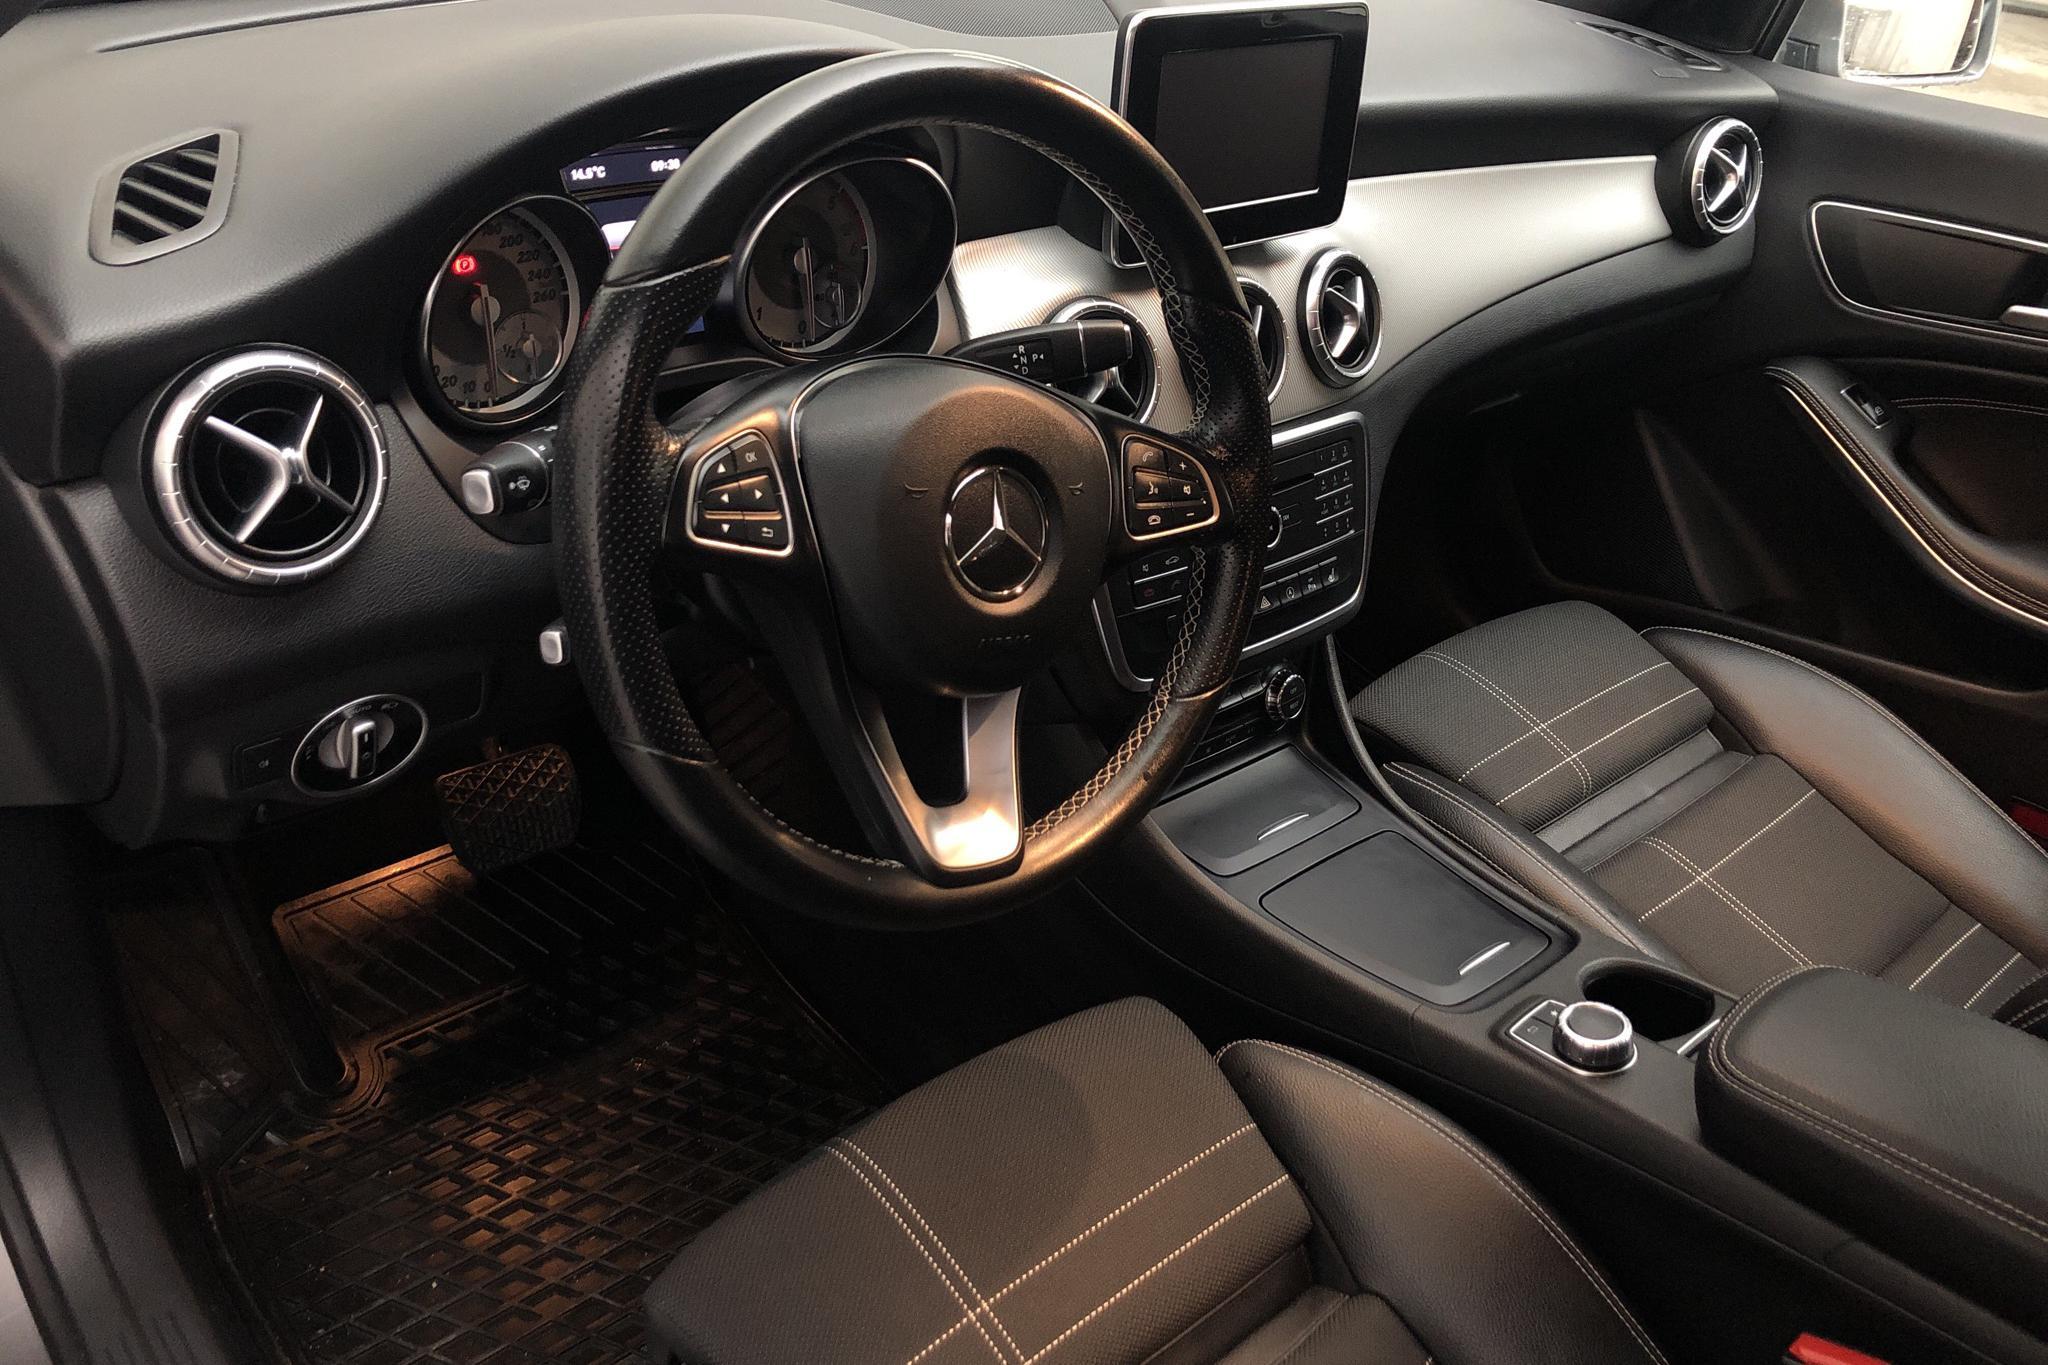 Mercedes CLA 220 d Shooting Brake X117 (177hk) - 12 562 mil - Automat - Dark Grey - 2016